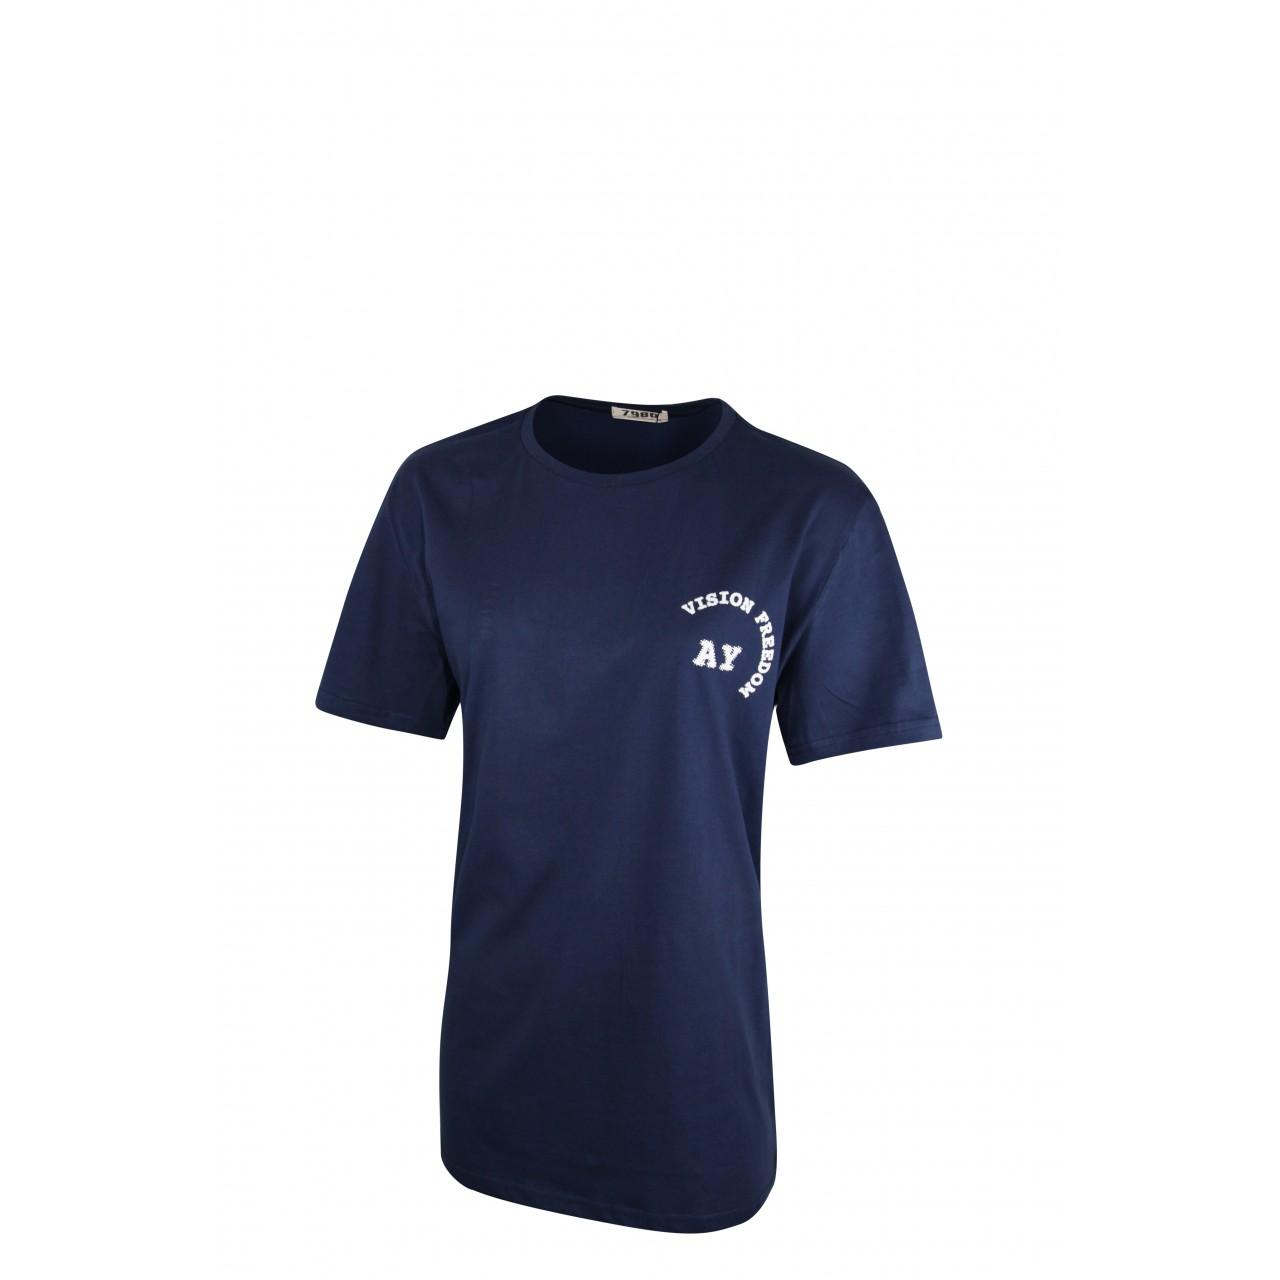 High Vision Men's Navy blue Crew Neck T-Shirt